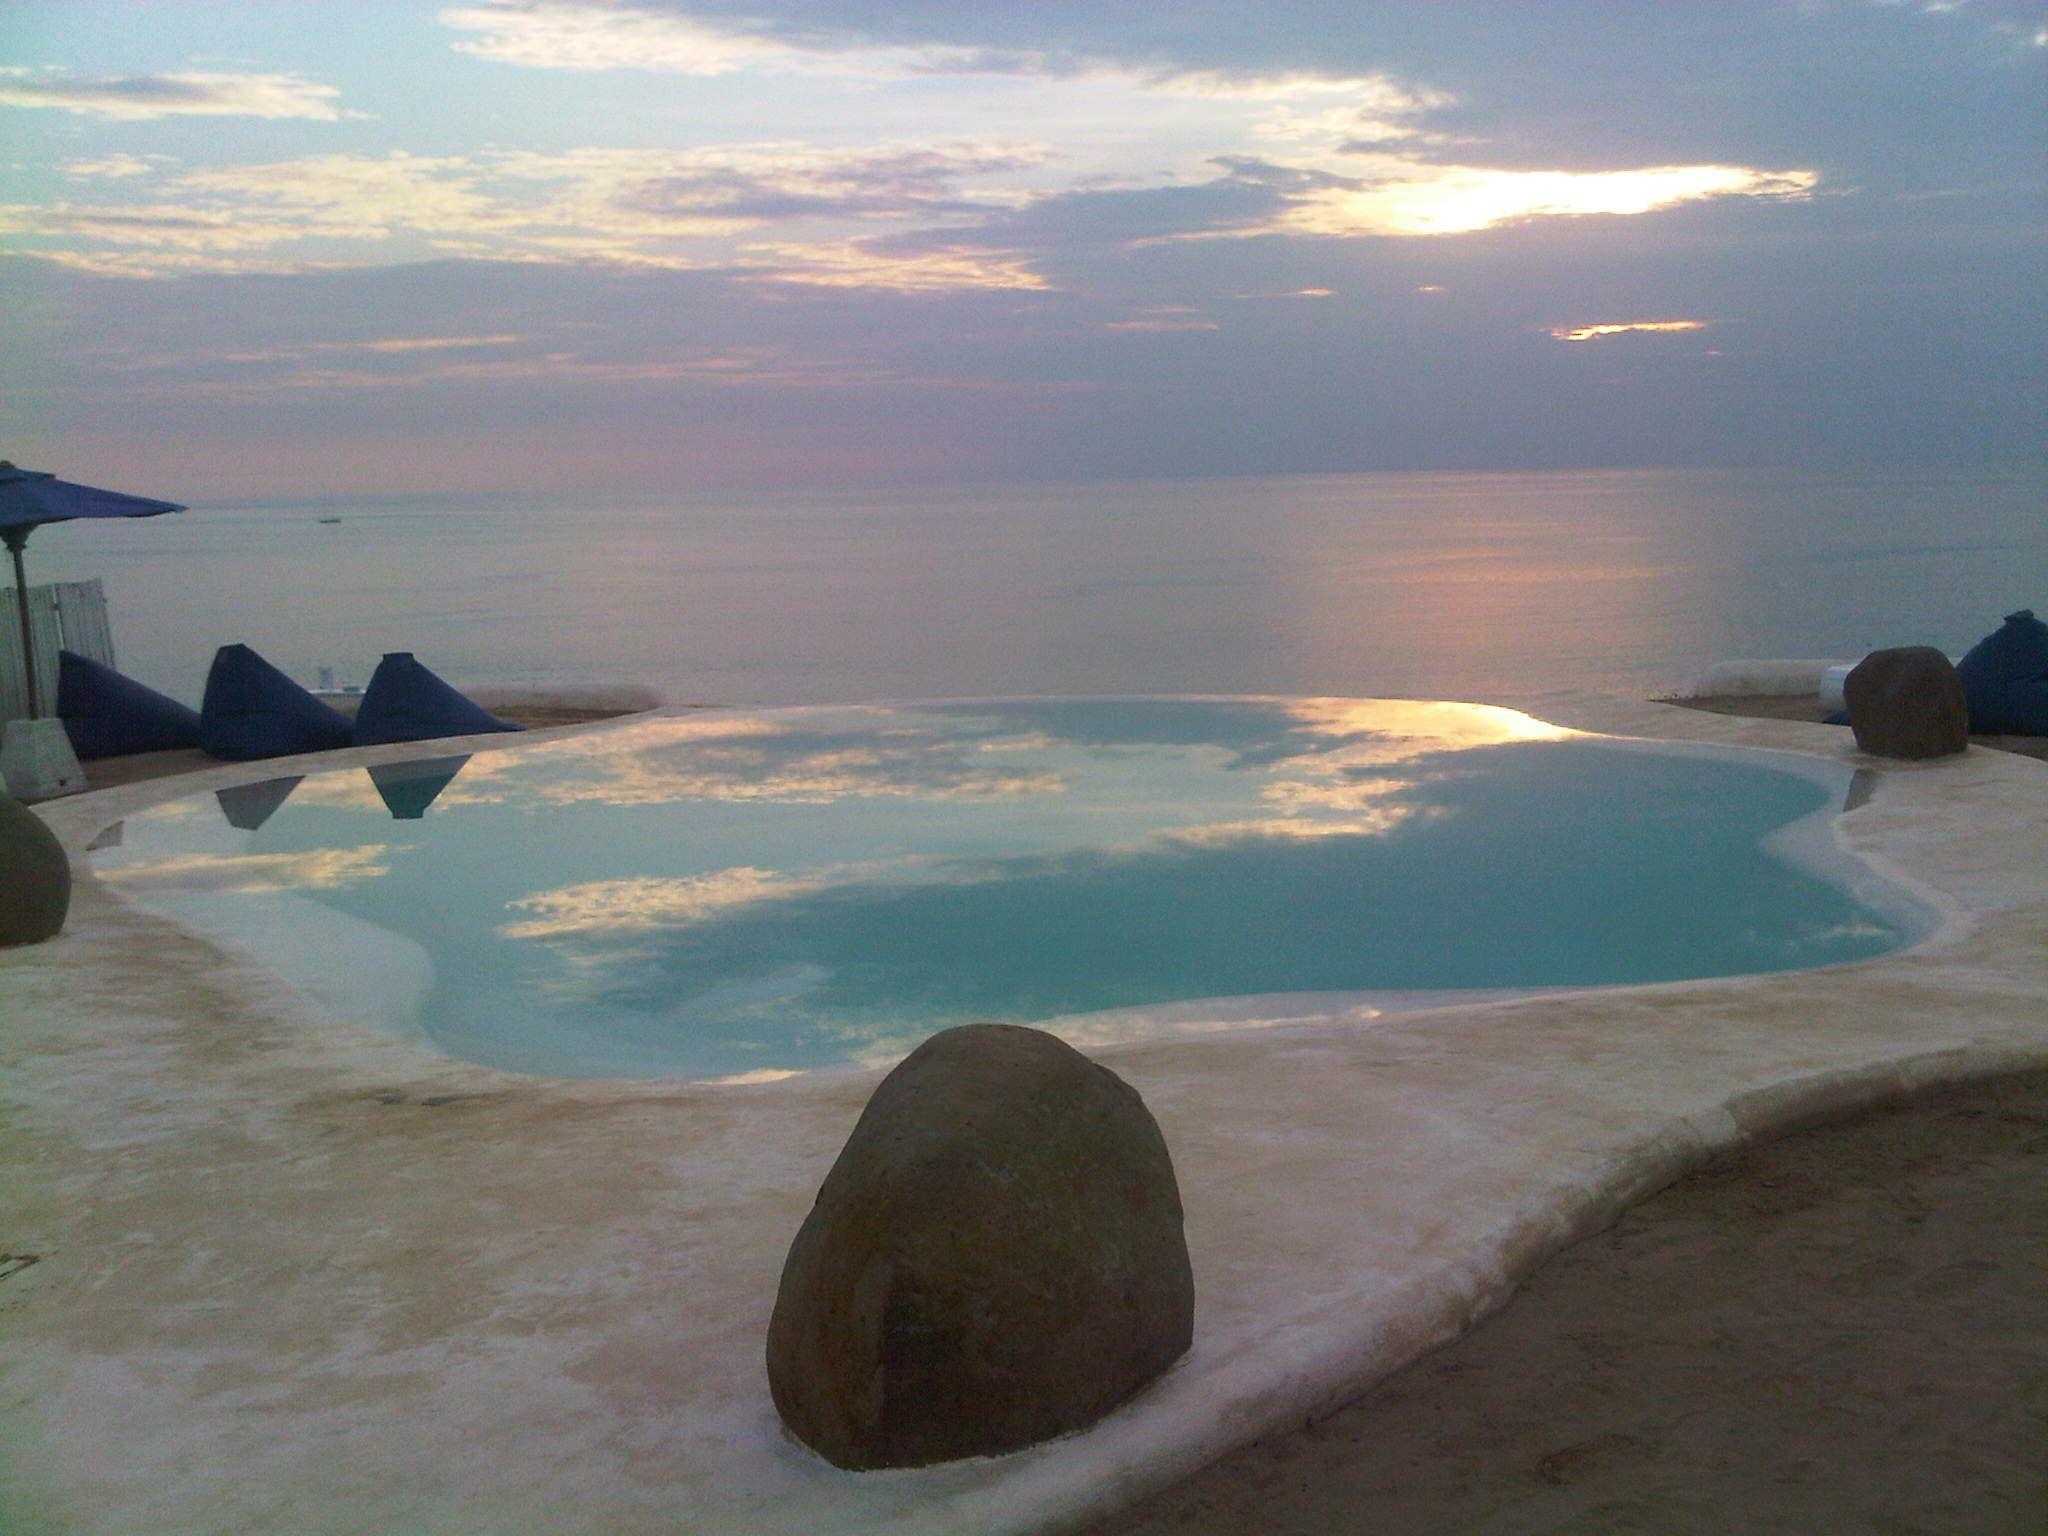 REVIEW: Super-swanky Katamama Hotel, Bali - TravelLuxe